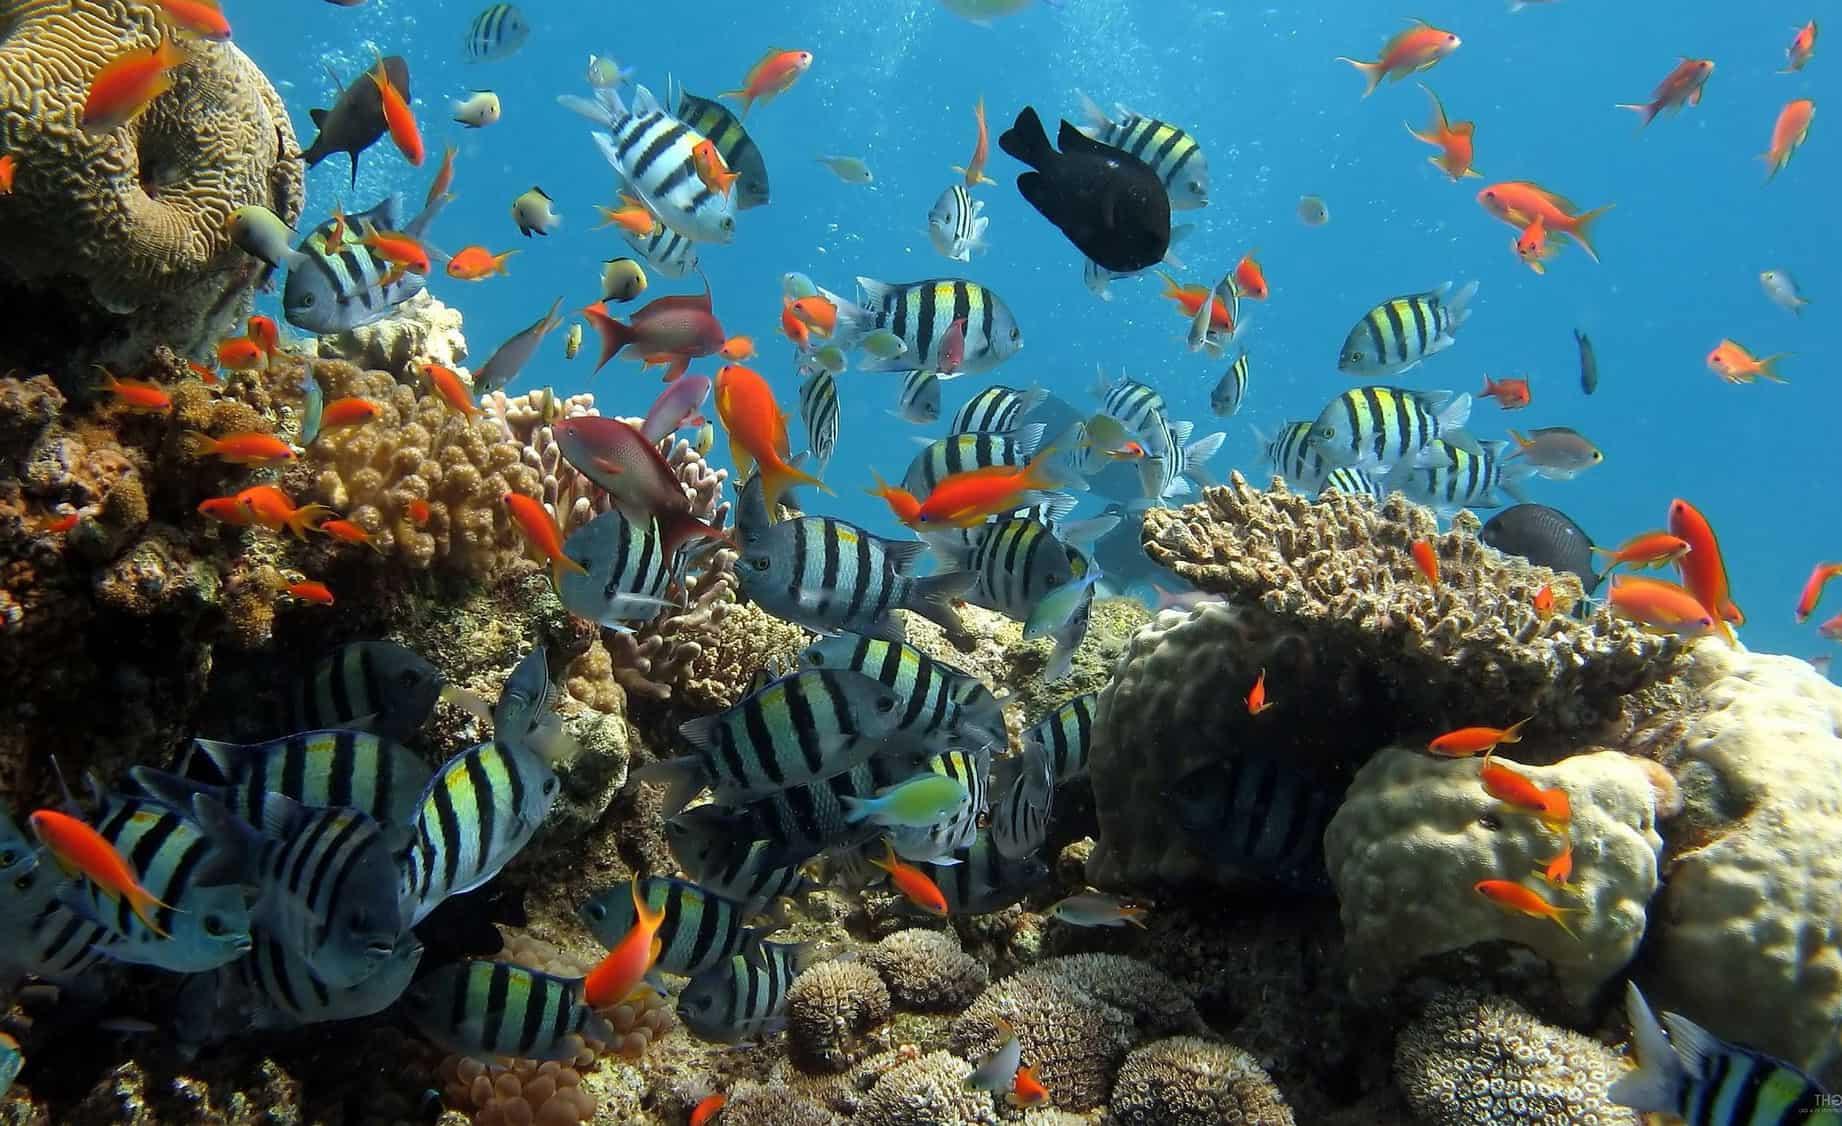 BeautyCounter Sunblock vs Coral Reefs